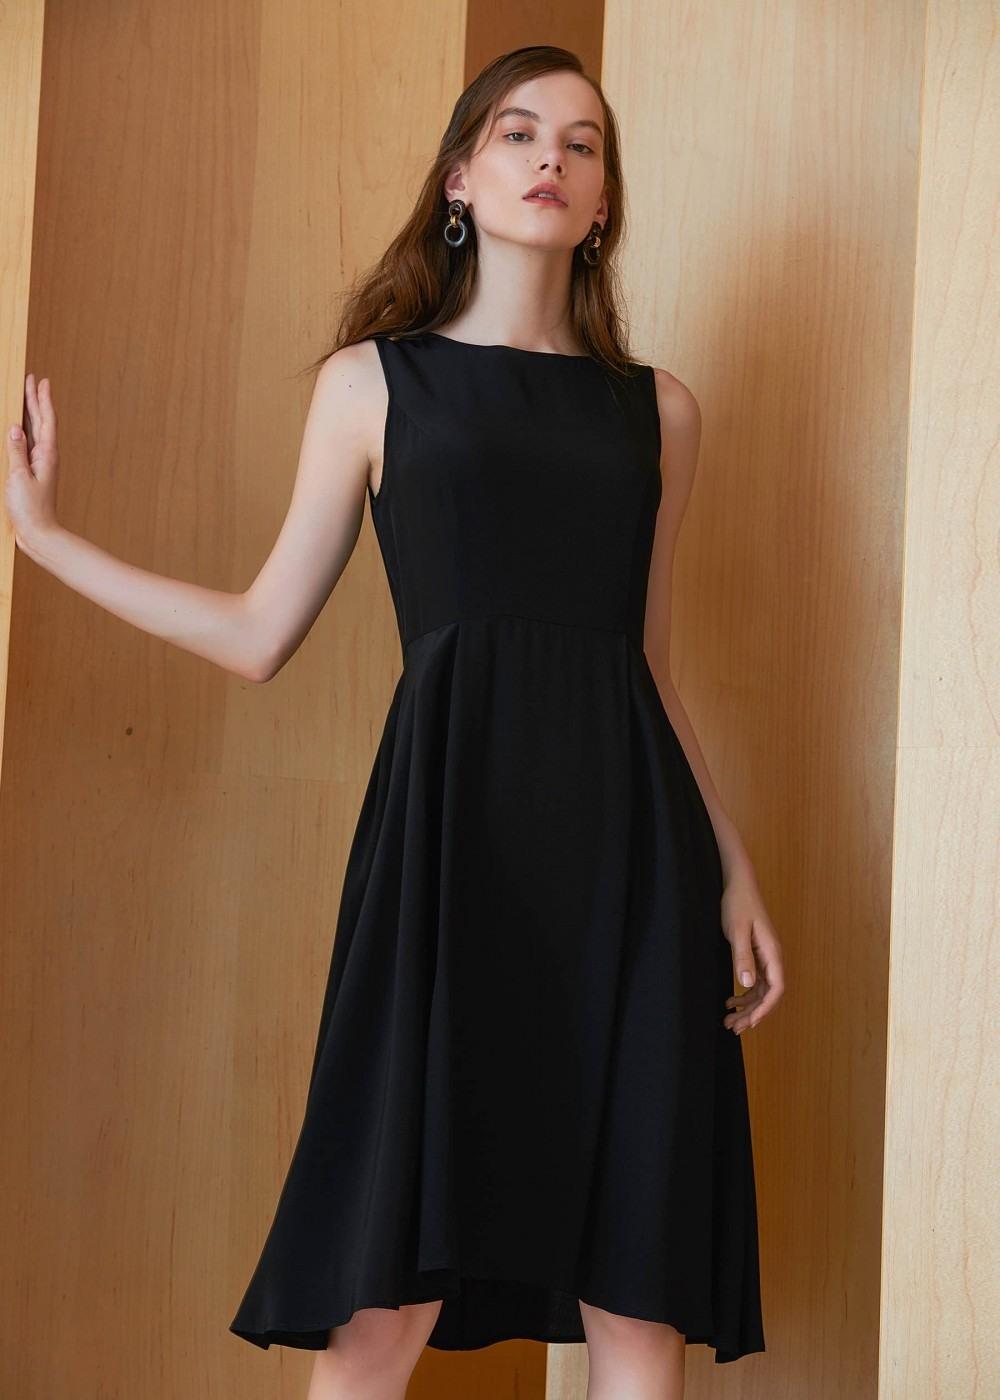 10 Luxus Schwarzes Kleid Design13 Cool Schwarzes Kleid Galerie